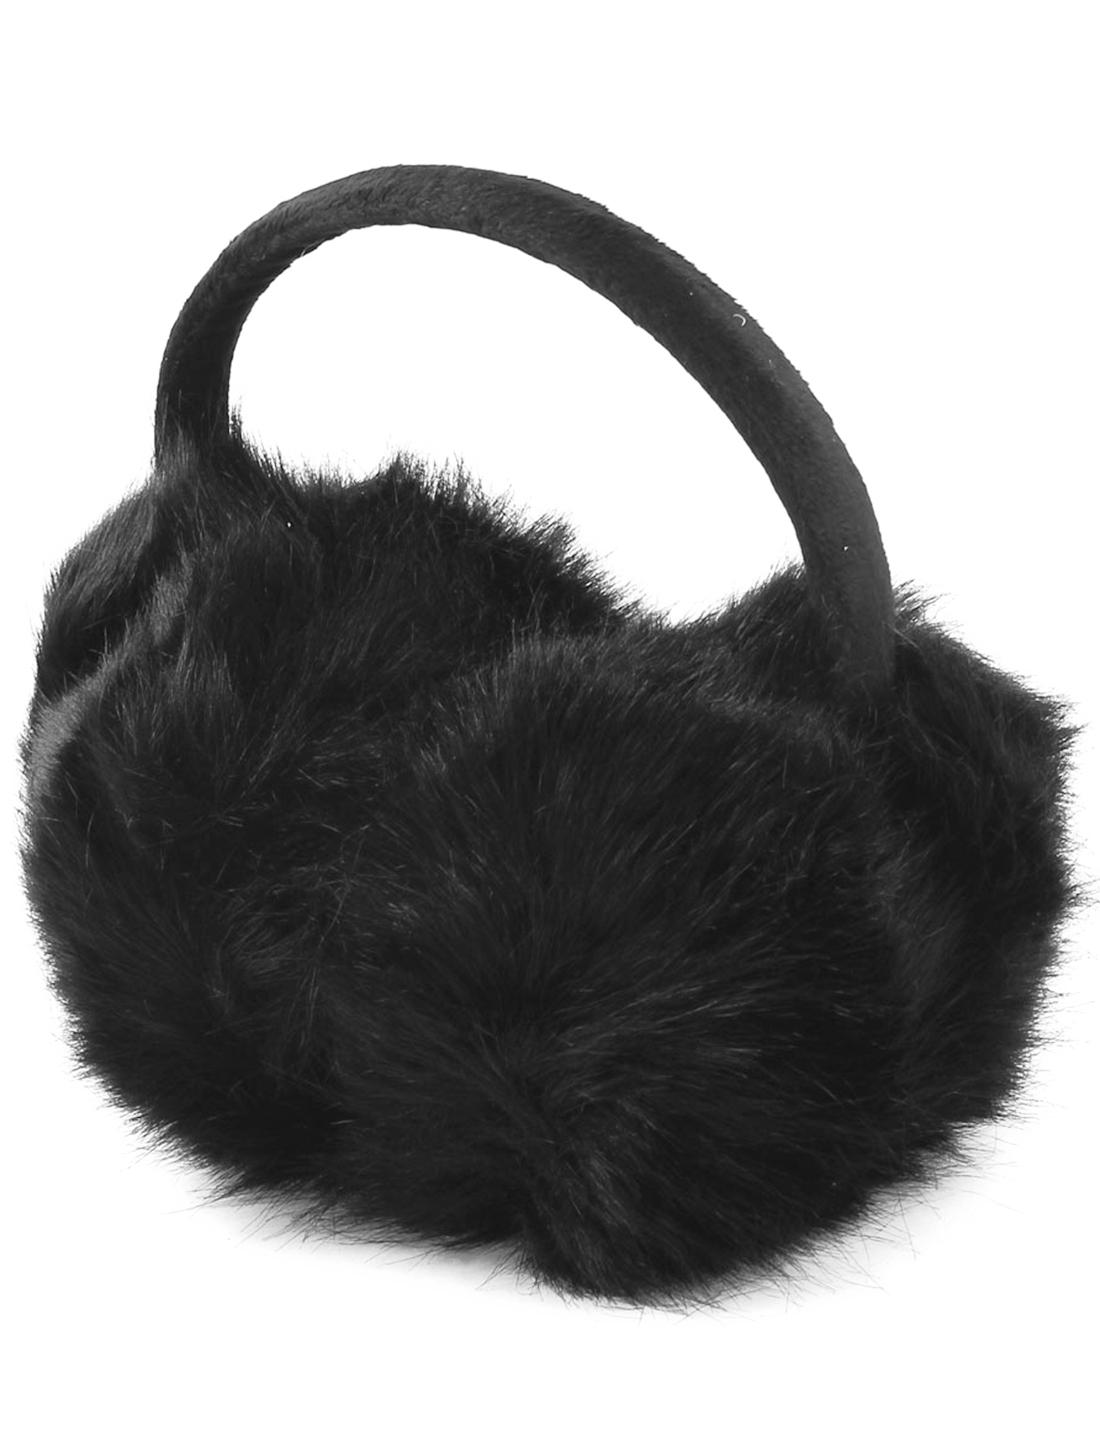 Lady Black Round Pads Winter Ear Warmer Pads Earmuffs Headband